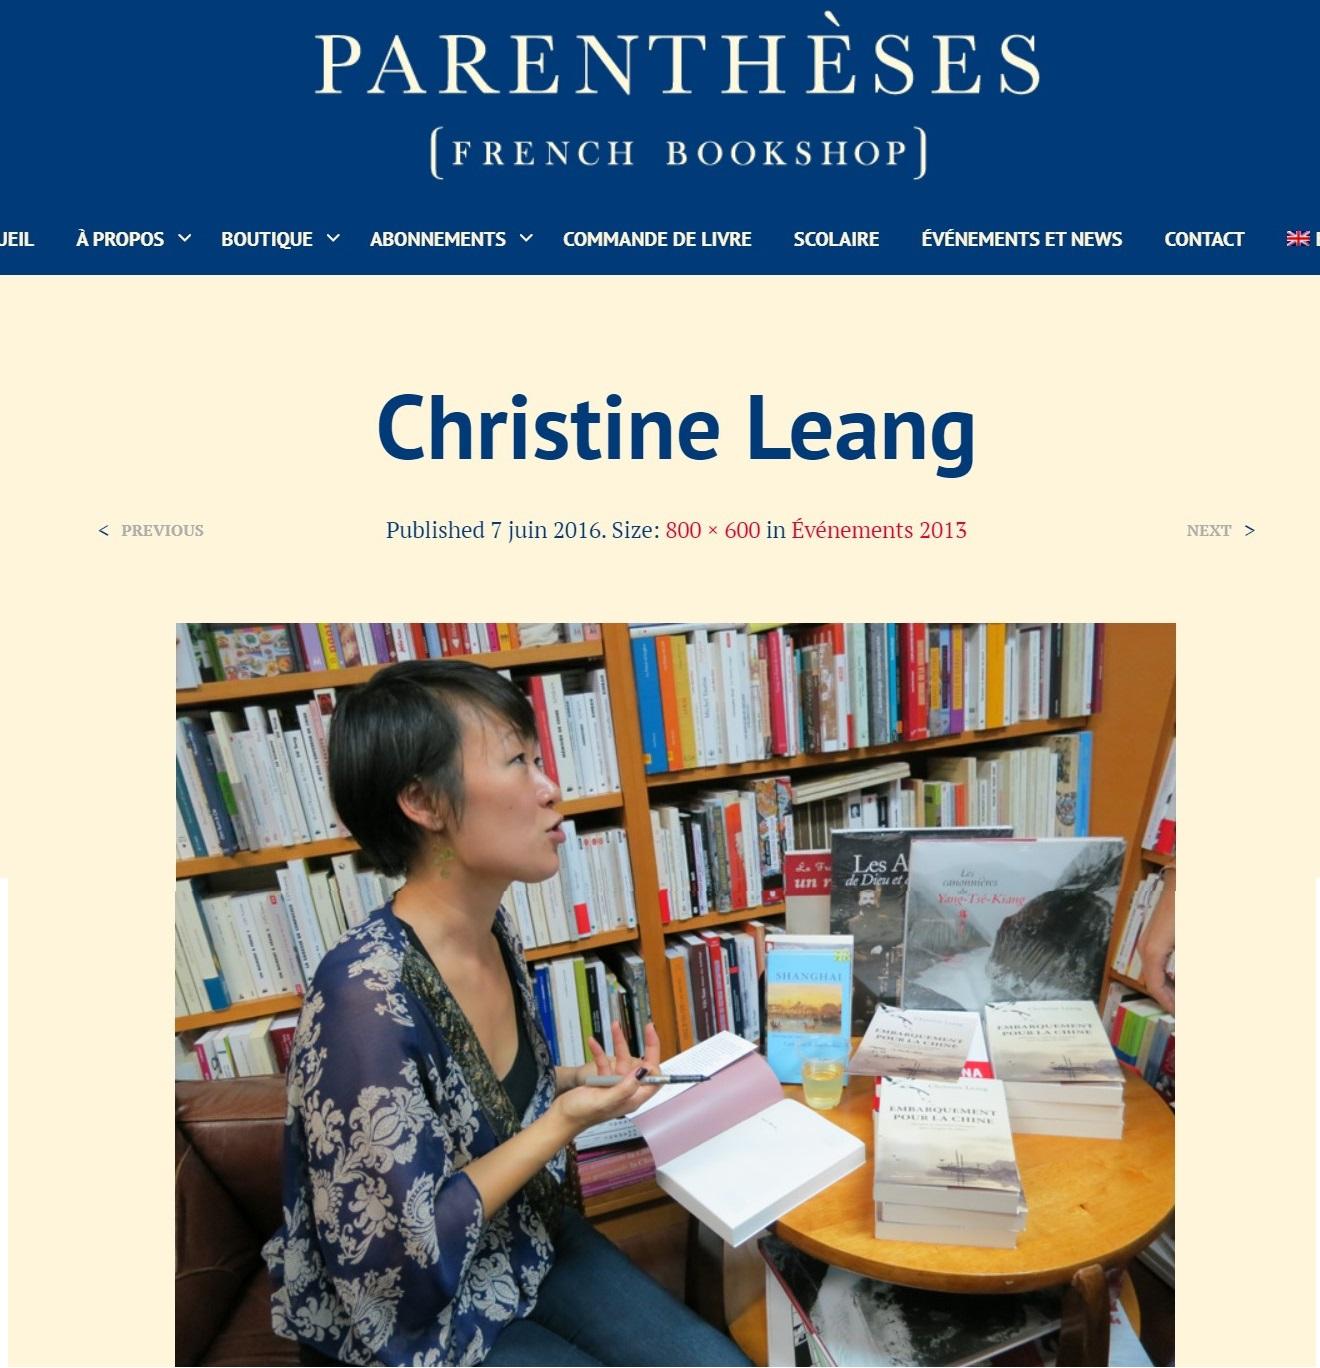 Christine Leang librairie Parenthèses Hong Kong, 7 juin 2016